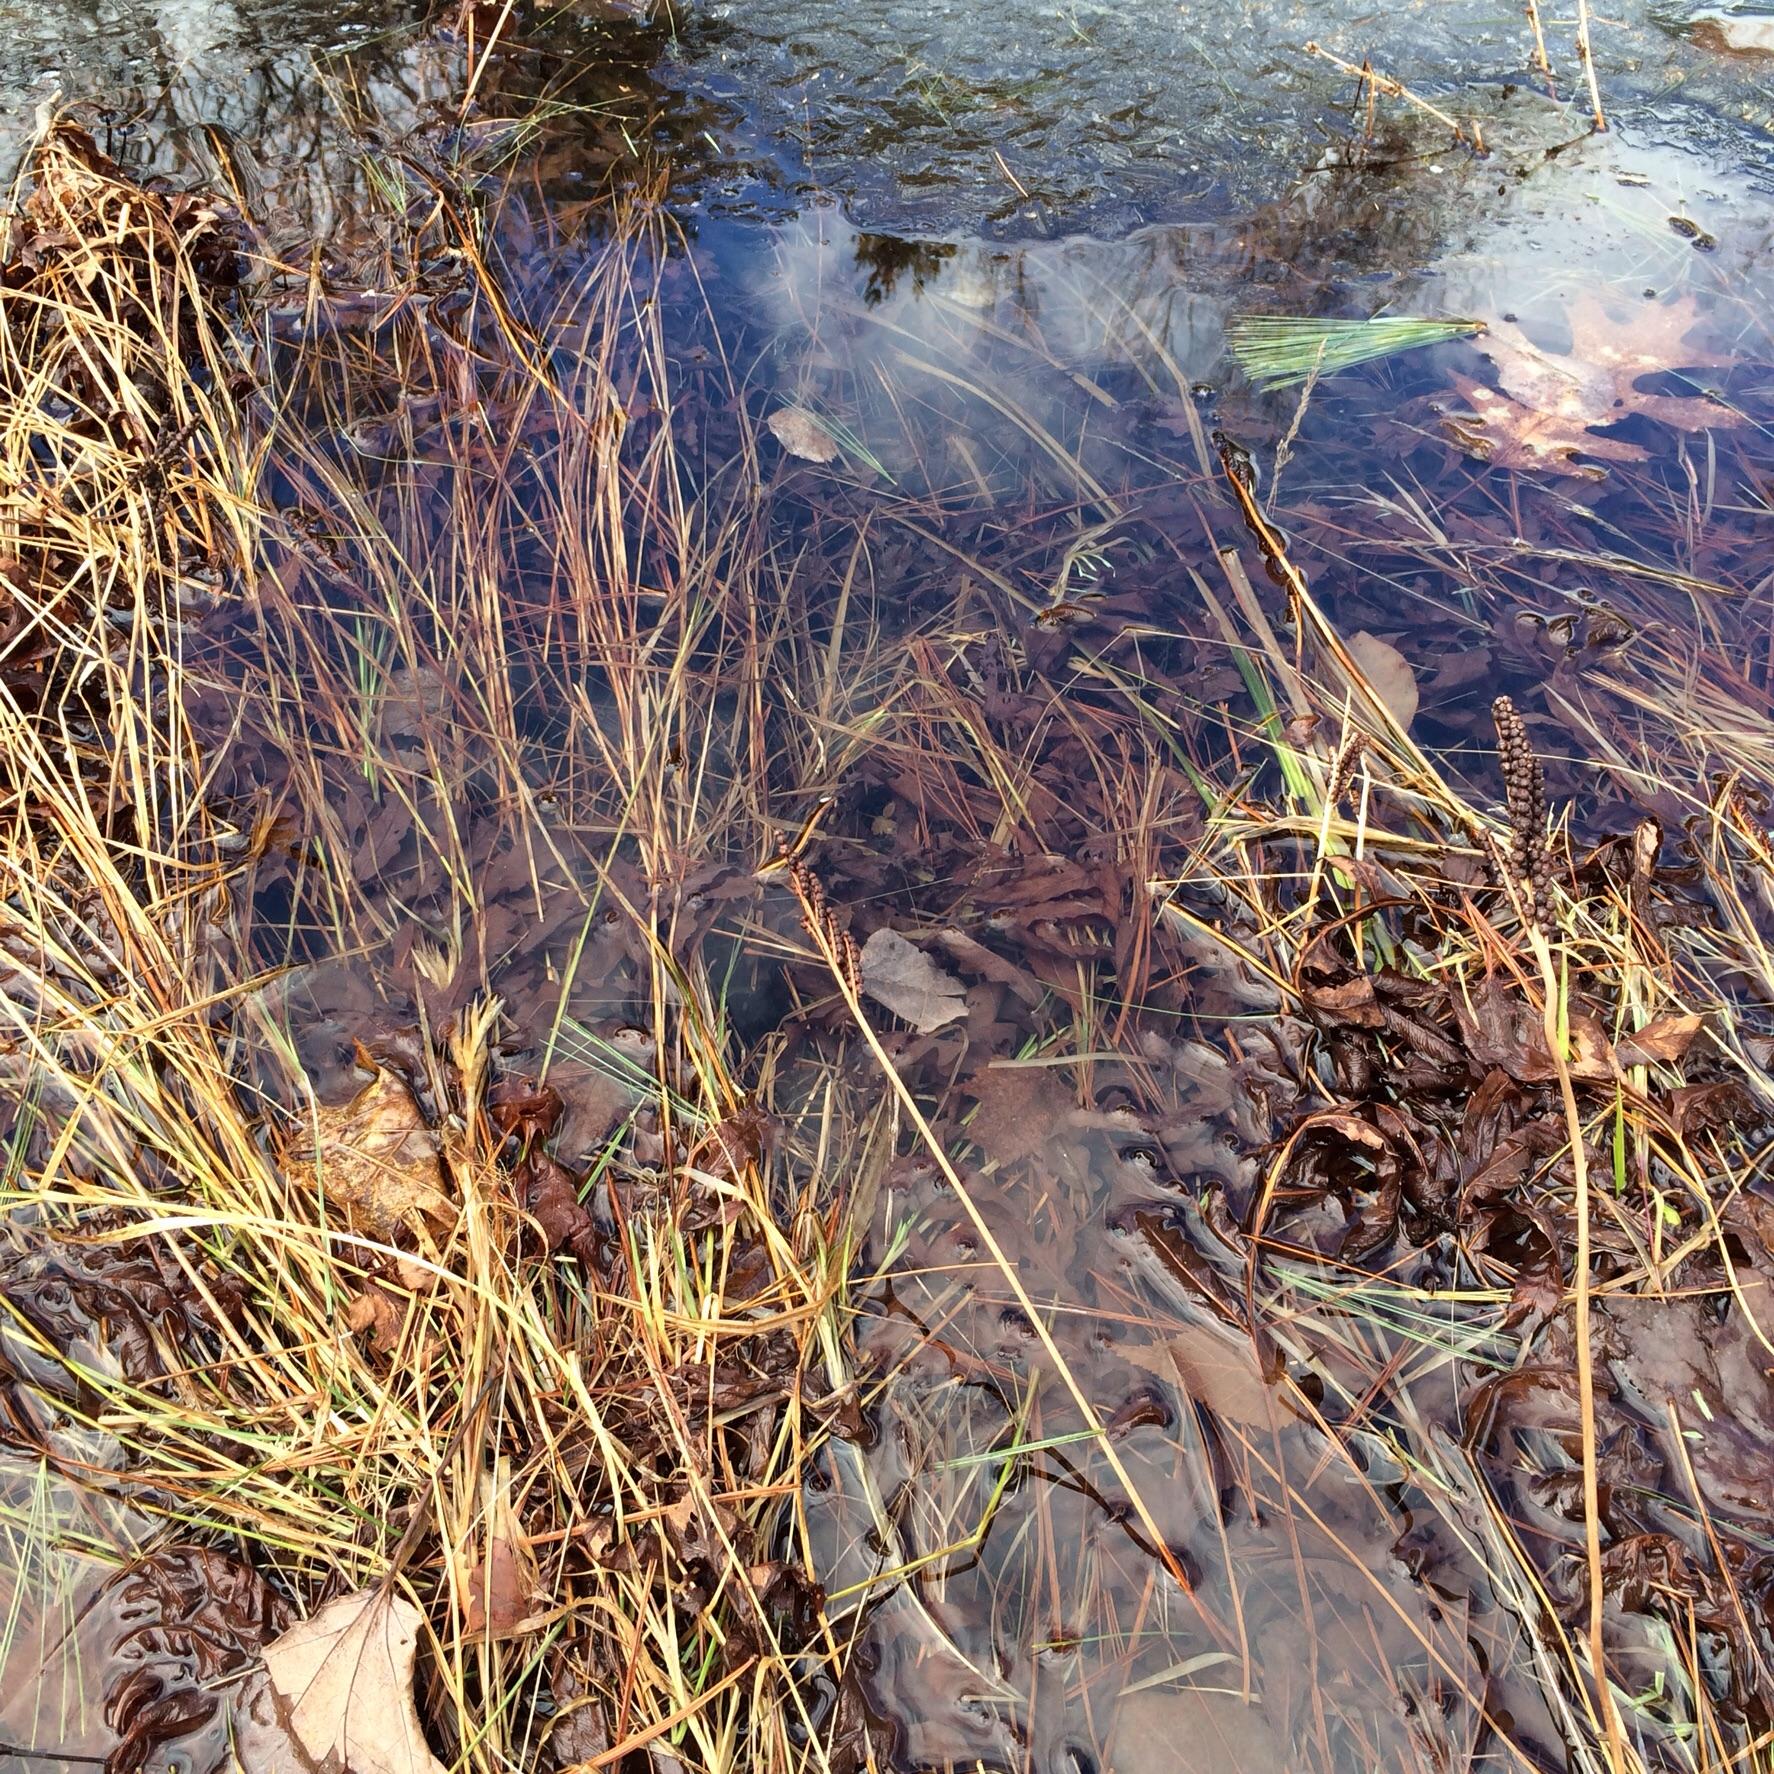 The shoreline post ice melt.